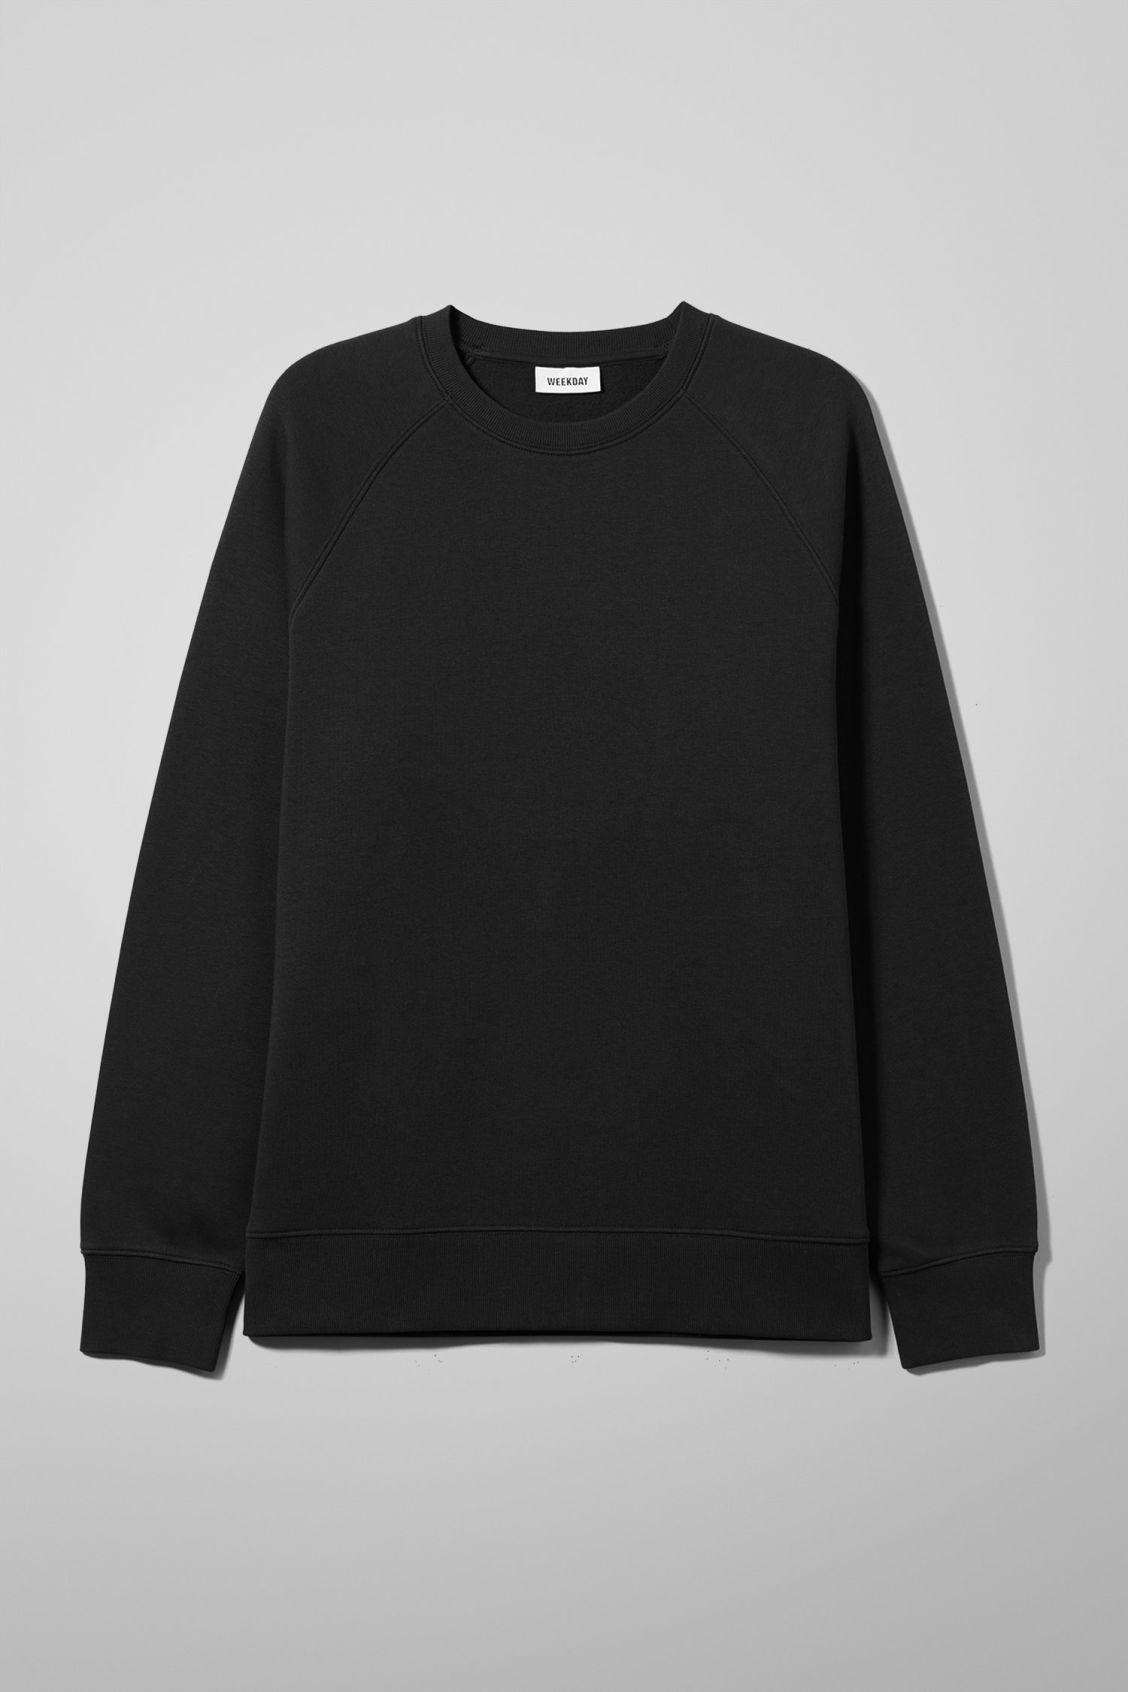 1ae98cebadaaf Alan T-shirt - Black - T-shirts   tops - Weekday